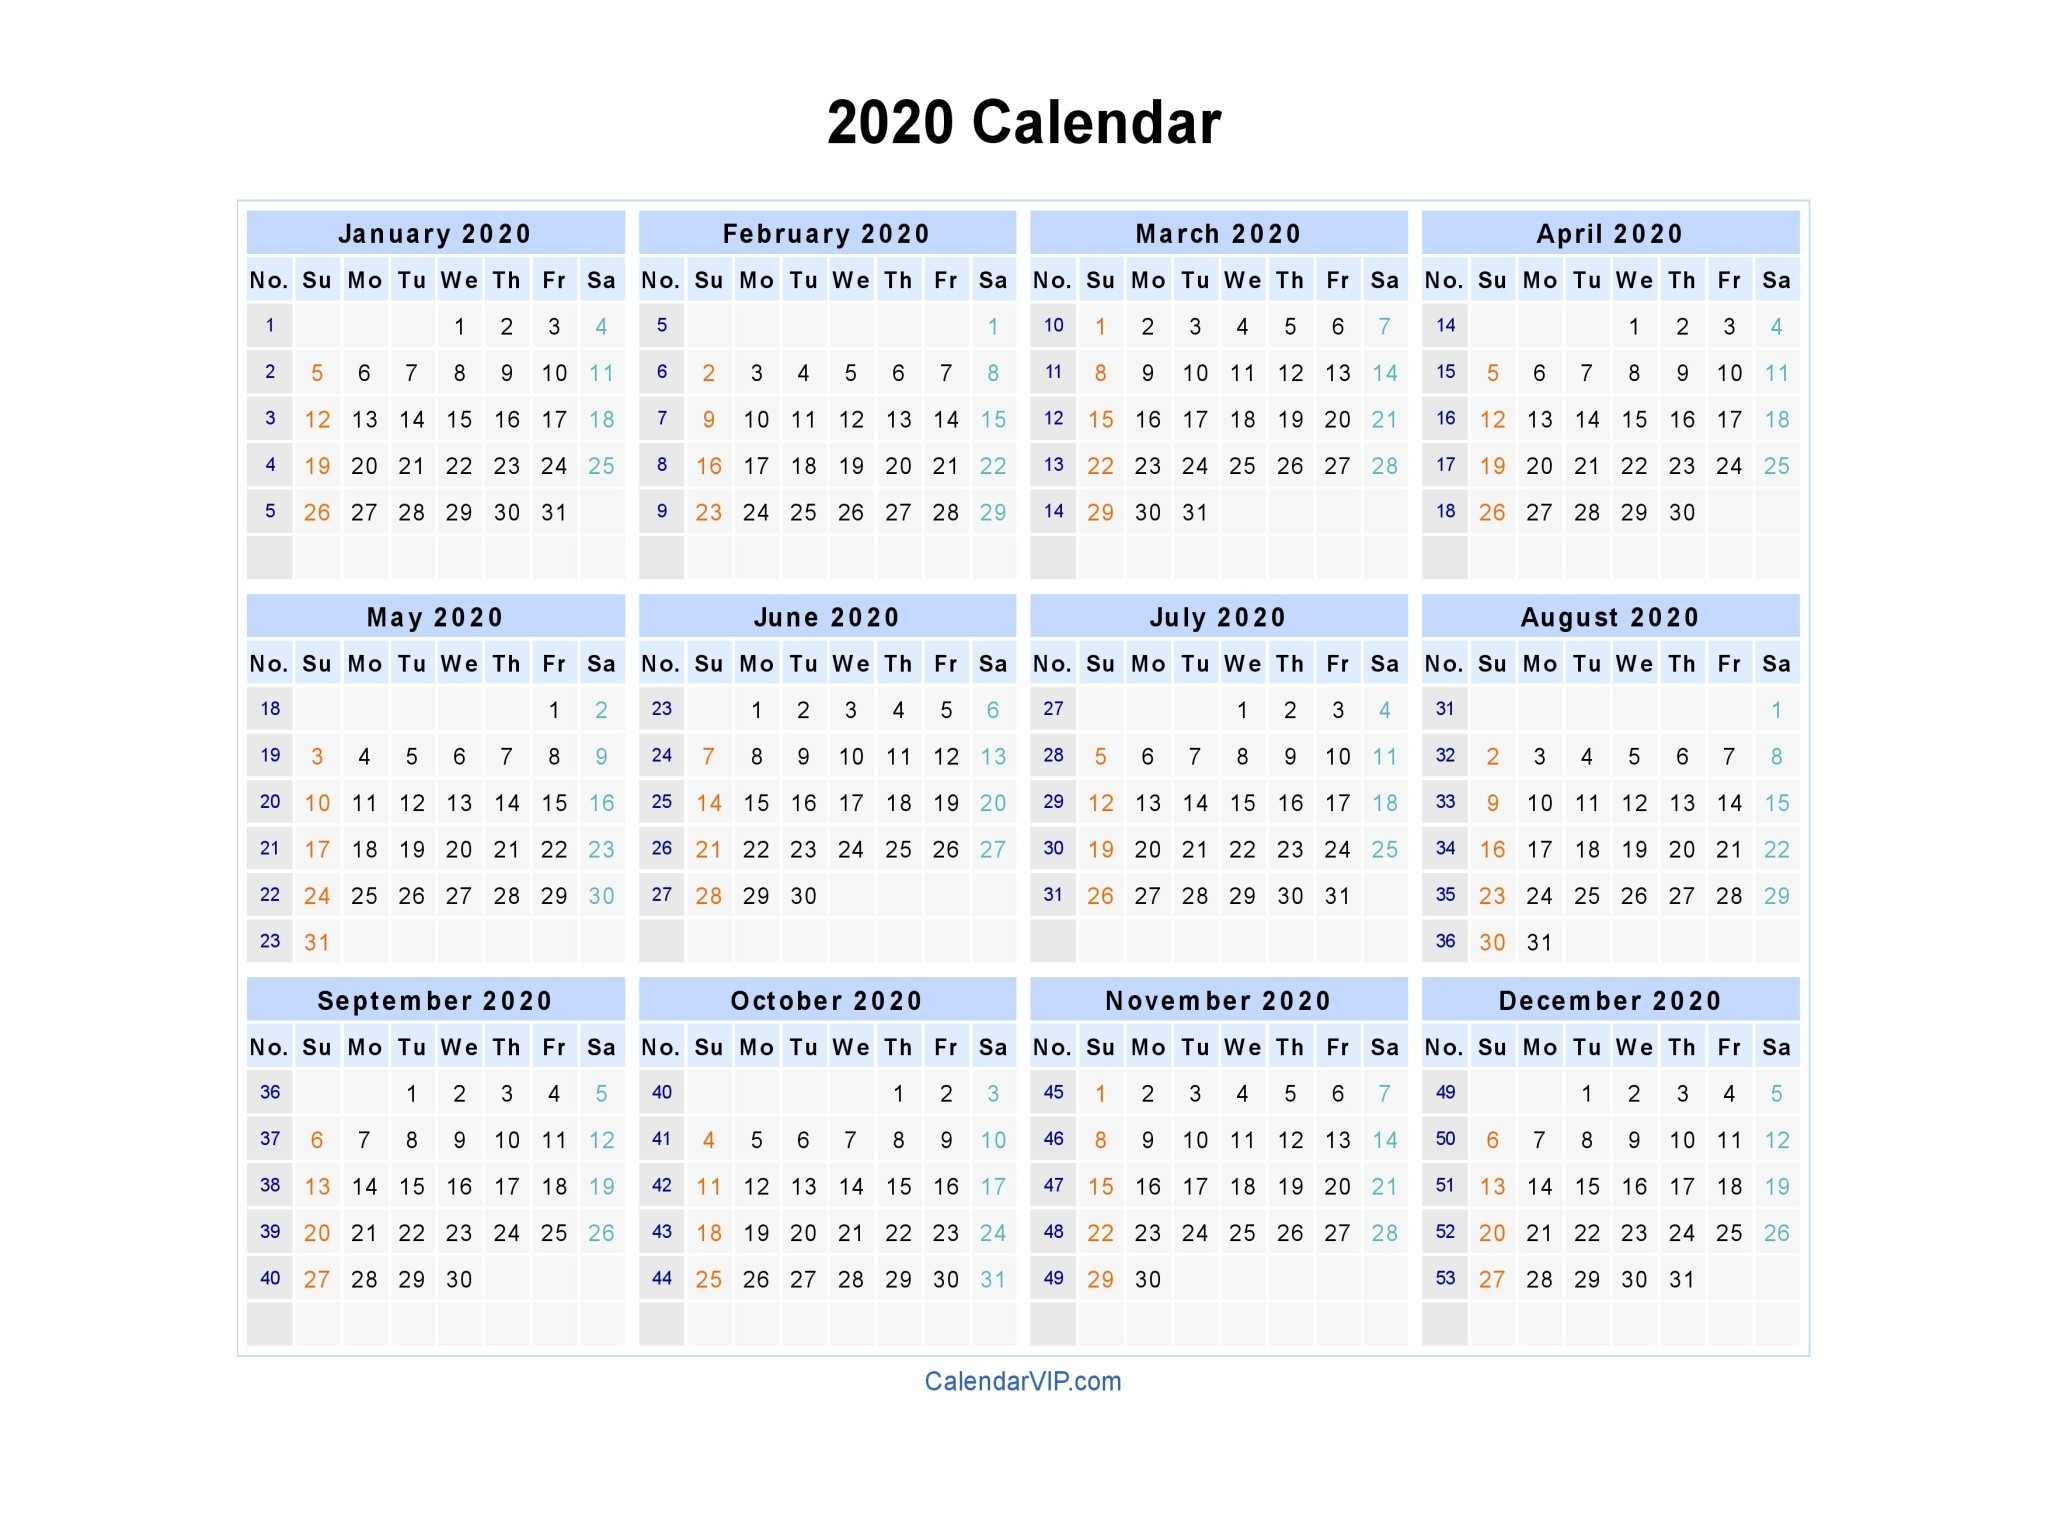 2020 Calendar - Blank Printable Calendar Template In Pdf  A3 Printable Calendar 2020